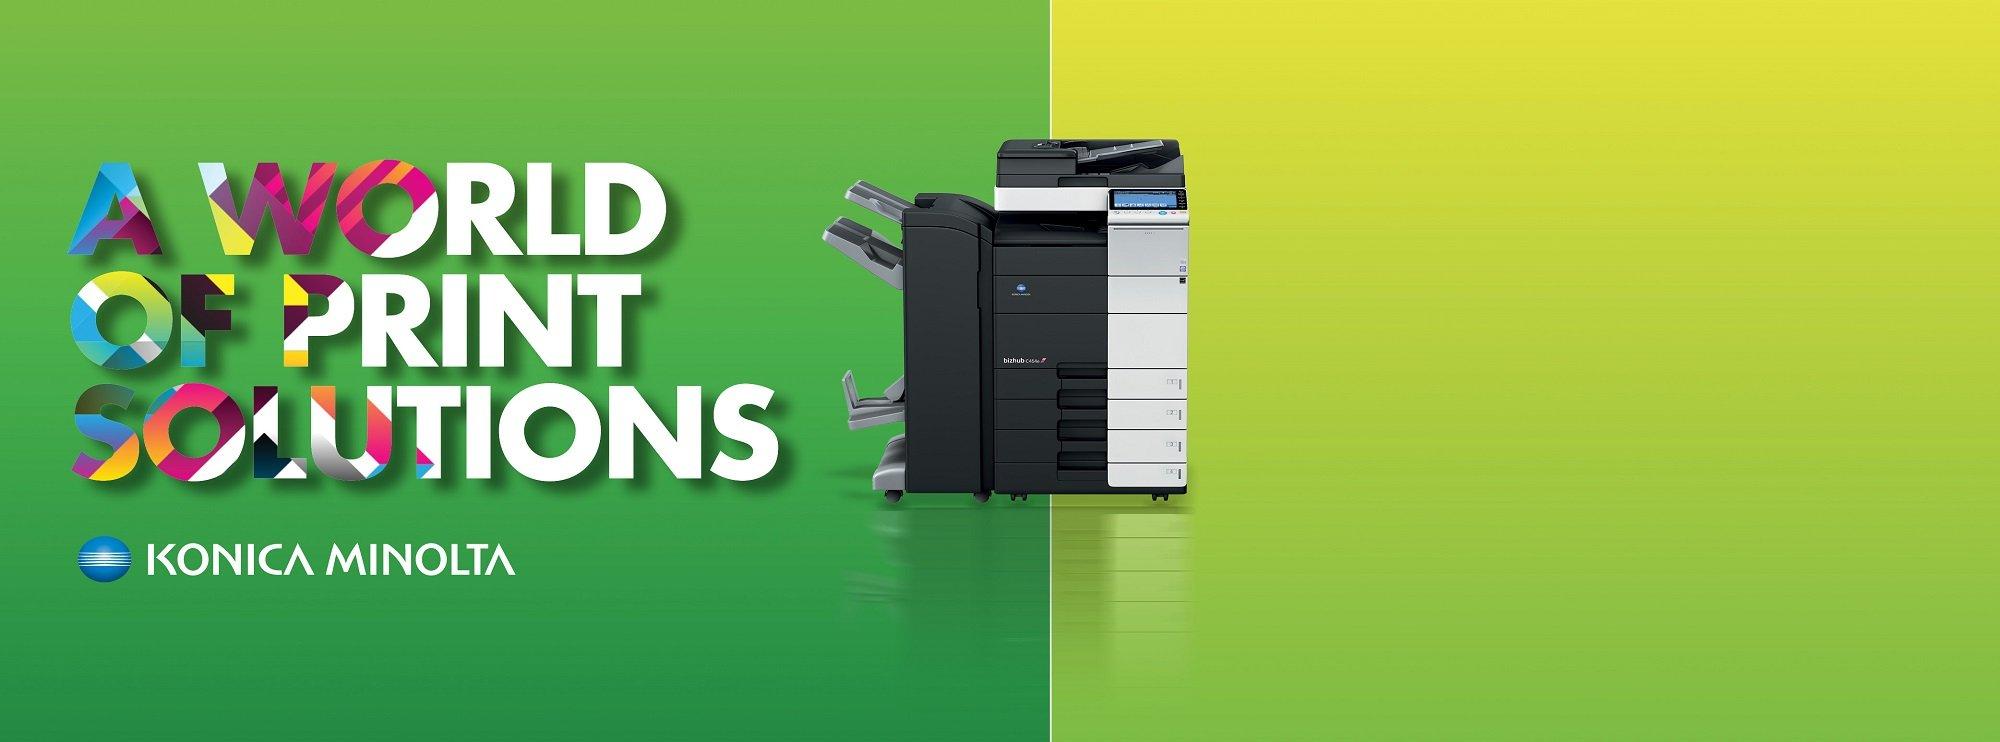 14 222 printers bunners 2000x7426 1 1, מדפסות לייזר צבע, מדפסות לייזר צבעוניות, מדפסות לייזר לעסק, מדפסות לייזר למשרד